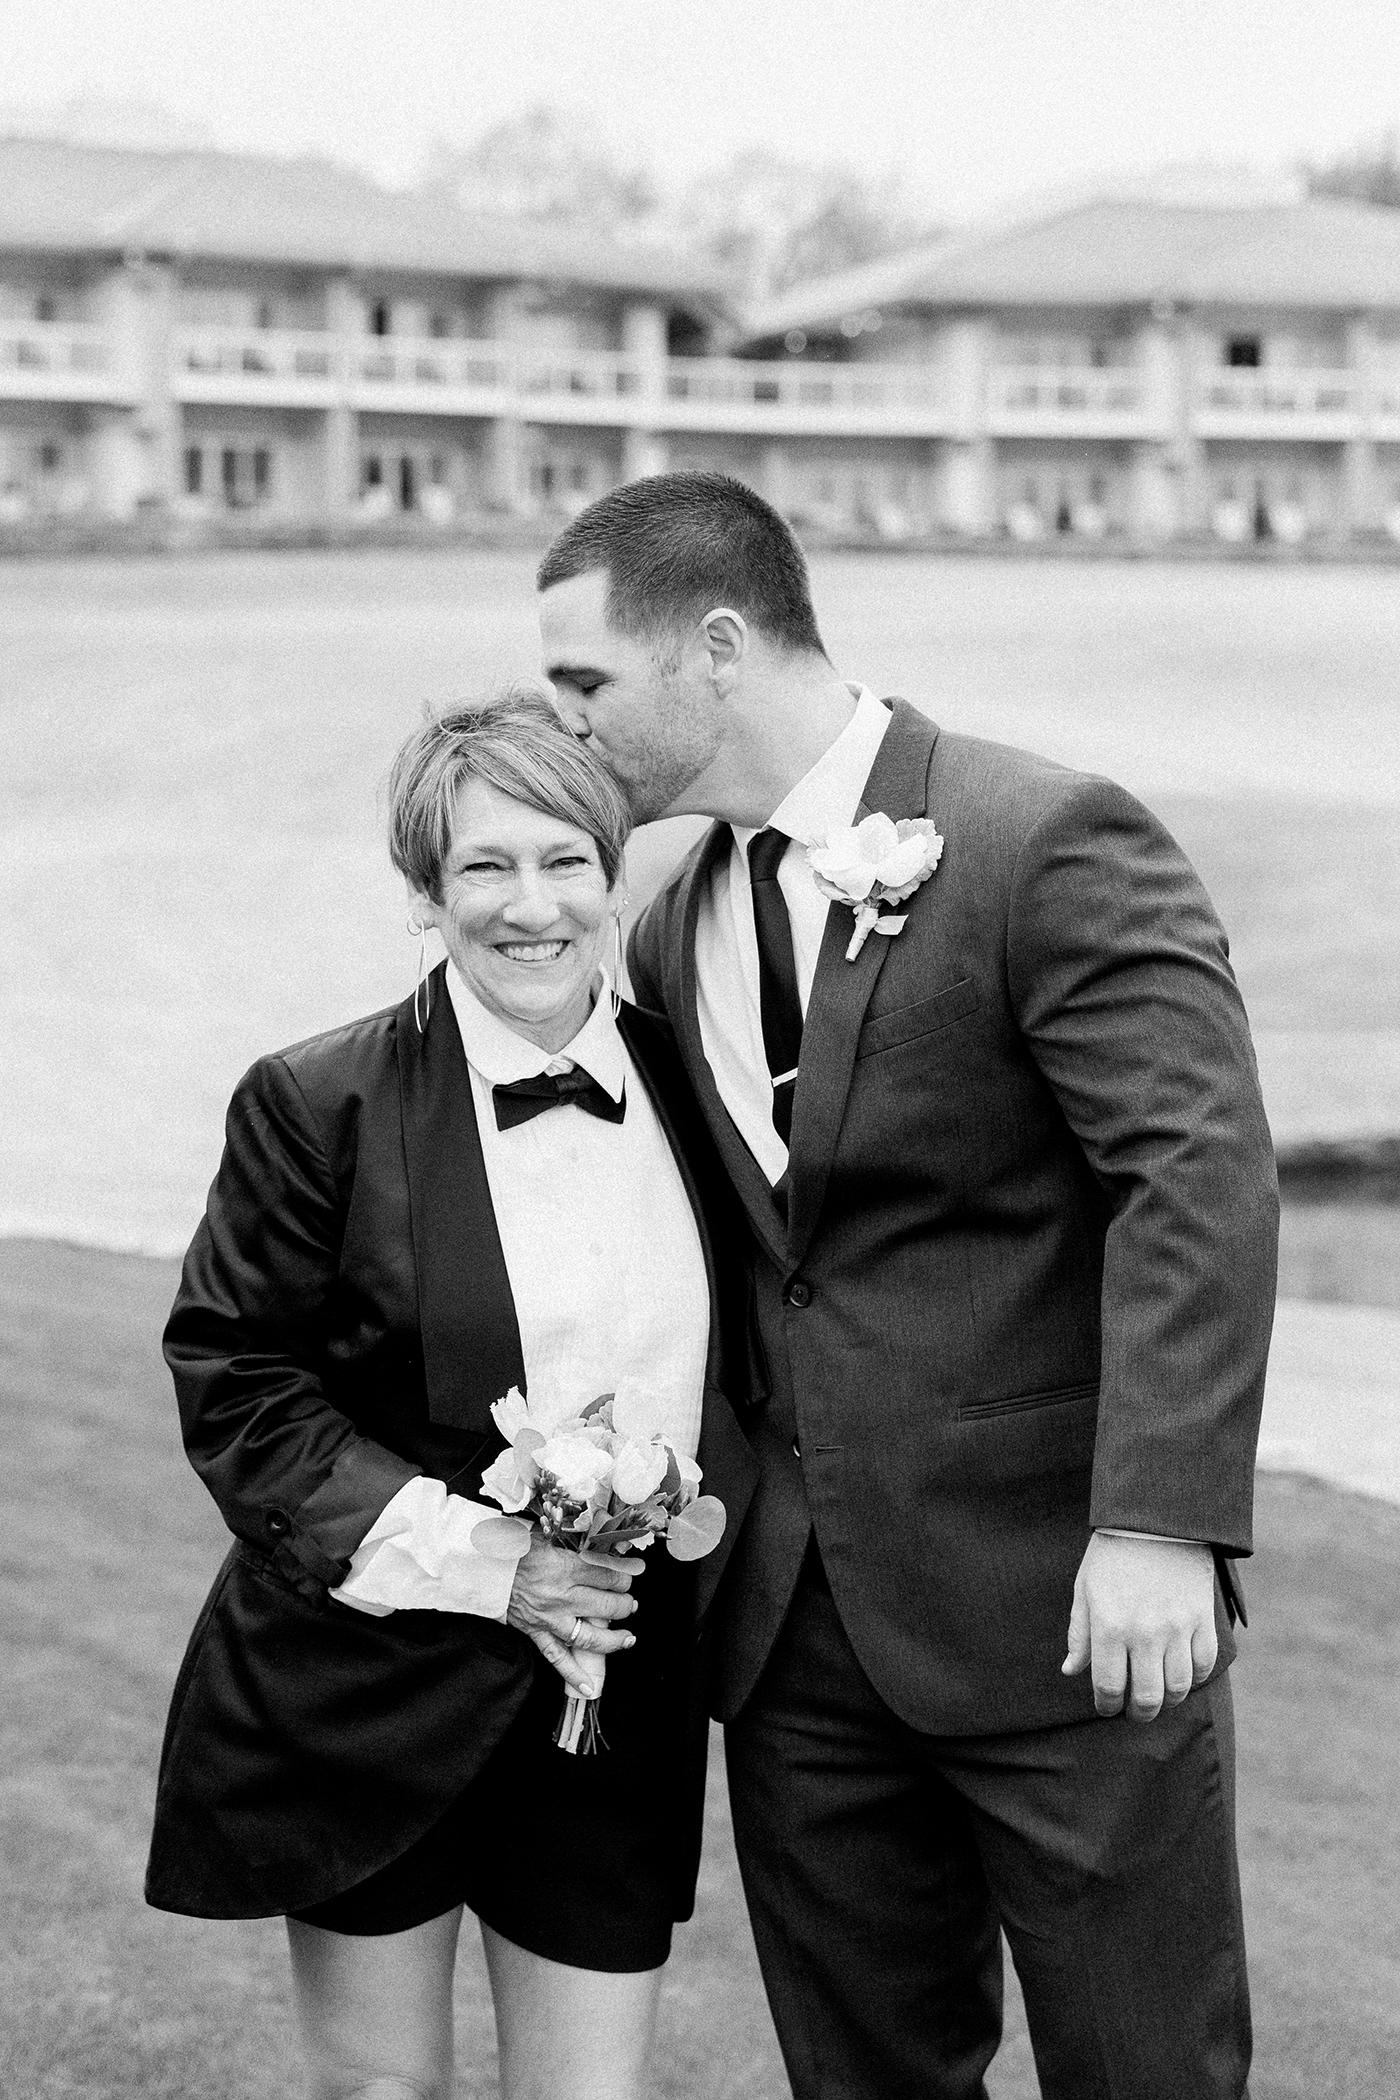 DFW Wedding Planner - Caroline + Jeff at The Four Seasons Hotel Wedding - Allday Events - 66.jpg